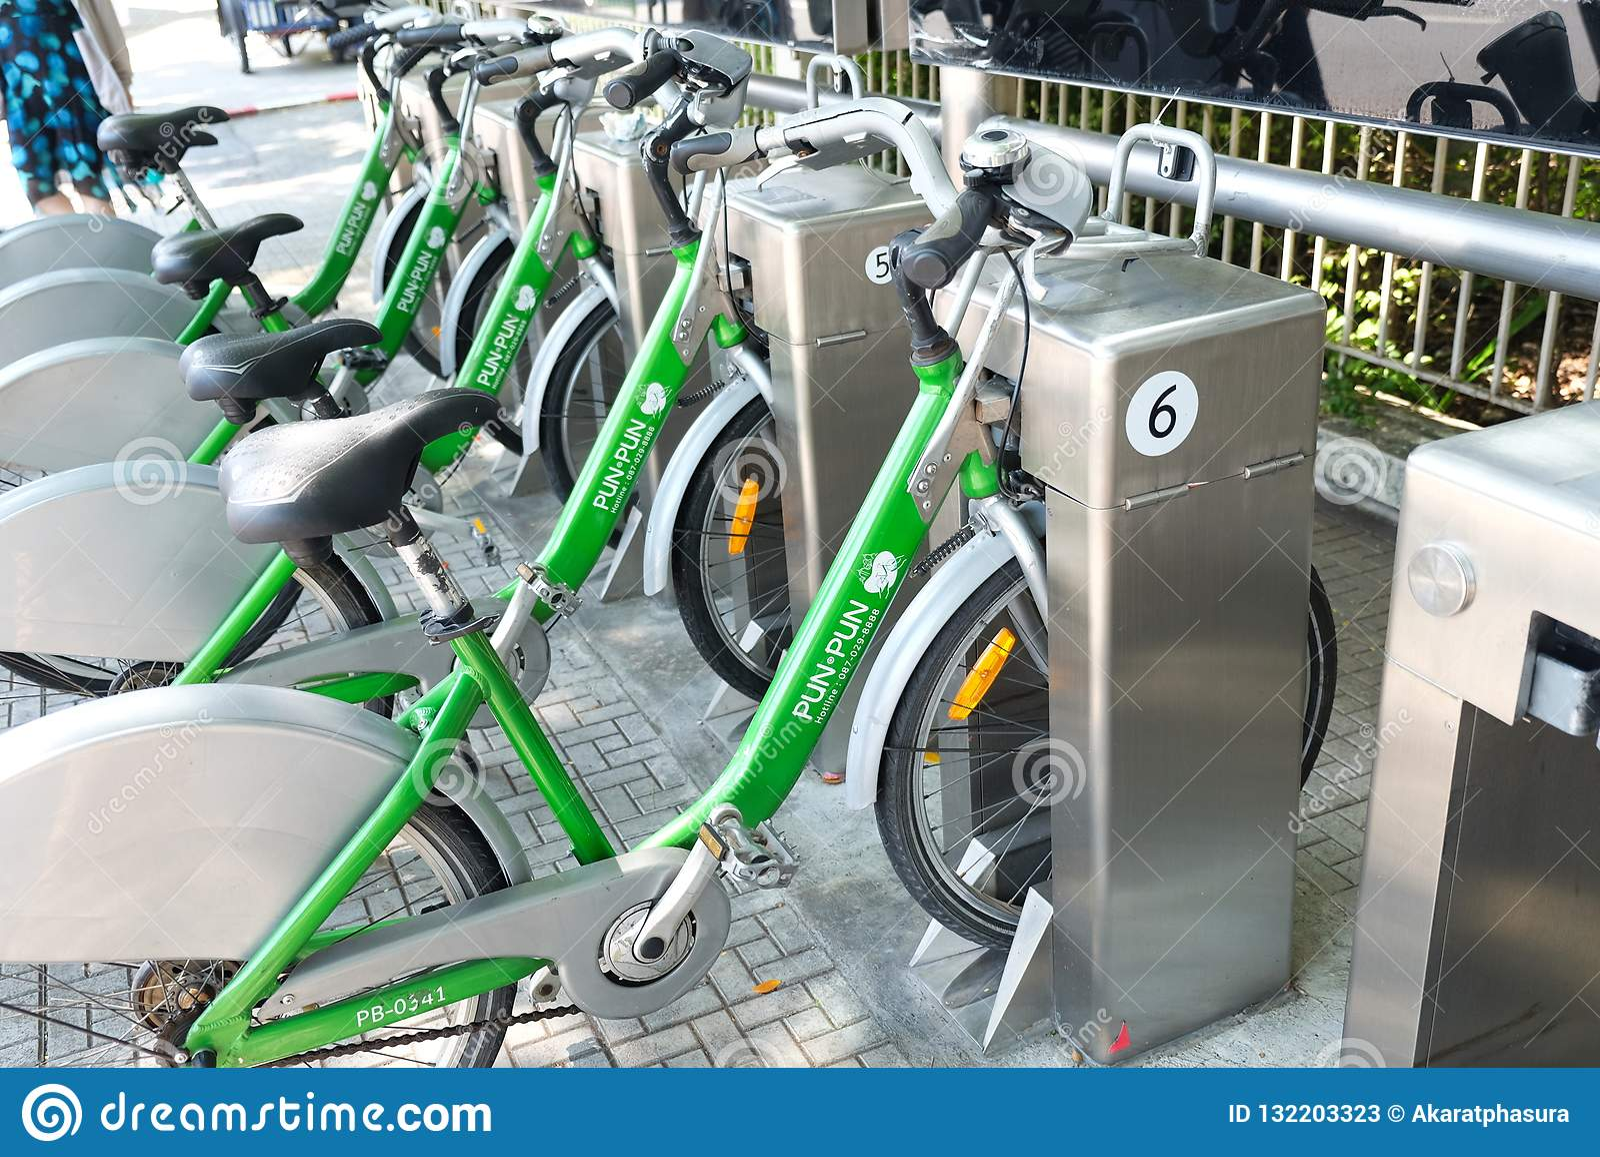 Bangkok, Thailand - 4 Oct 2018: PunPun, Openbaar fiets-Delend systeem in de stad van Bangkok